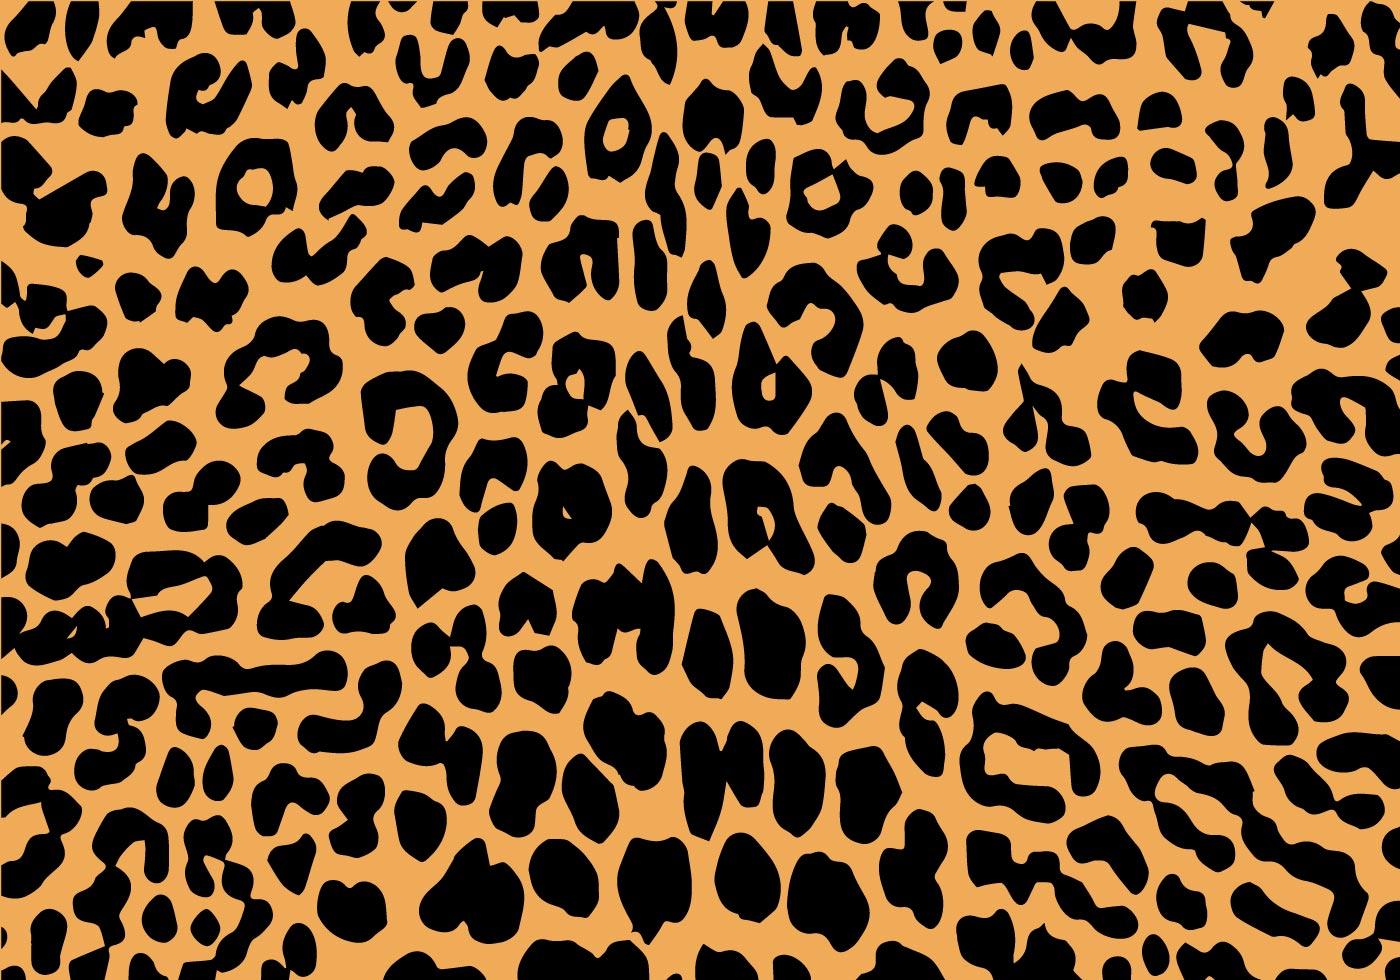 1400x980 Leopard Print Free Vector Art